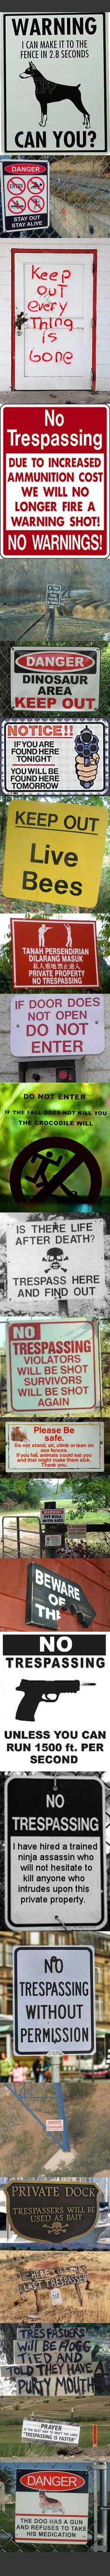 Brutally honest no trespassing signs